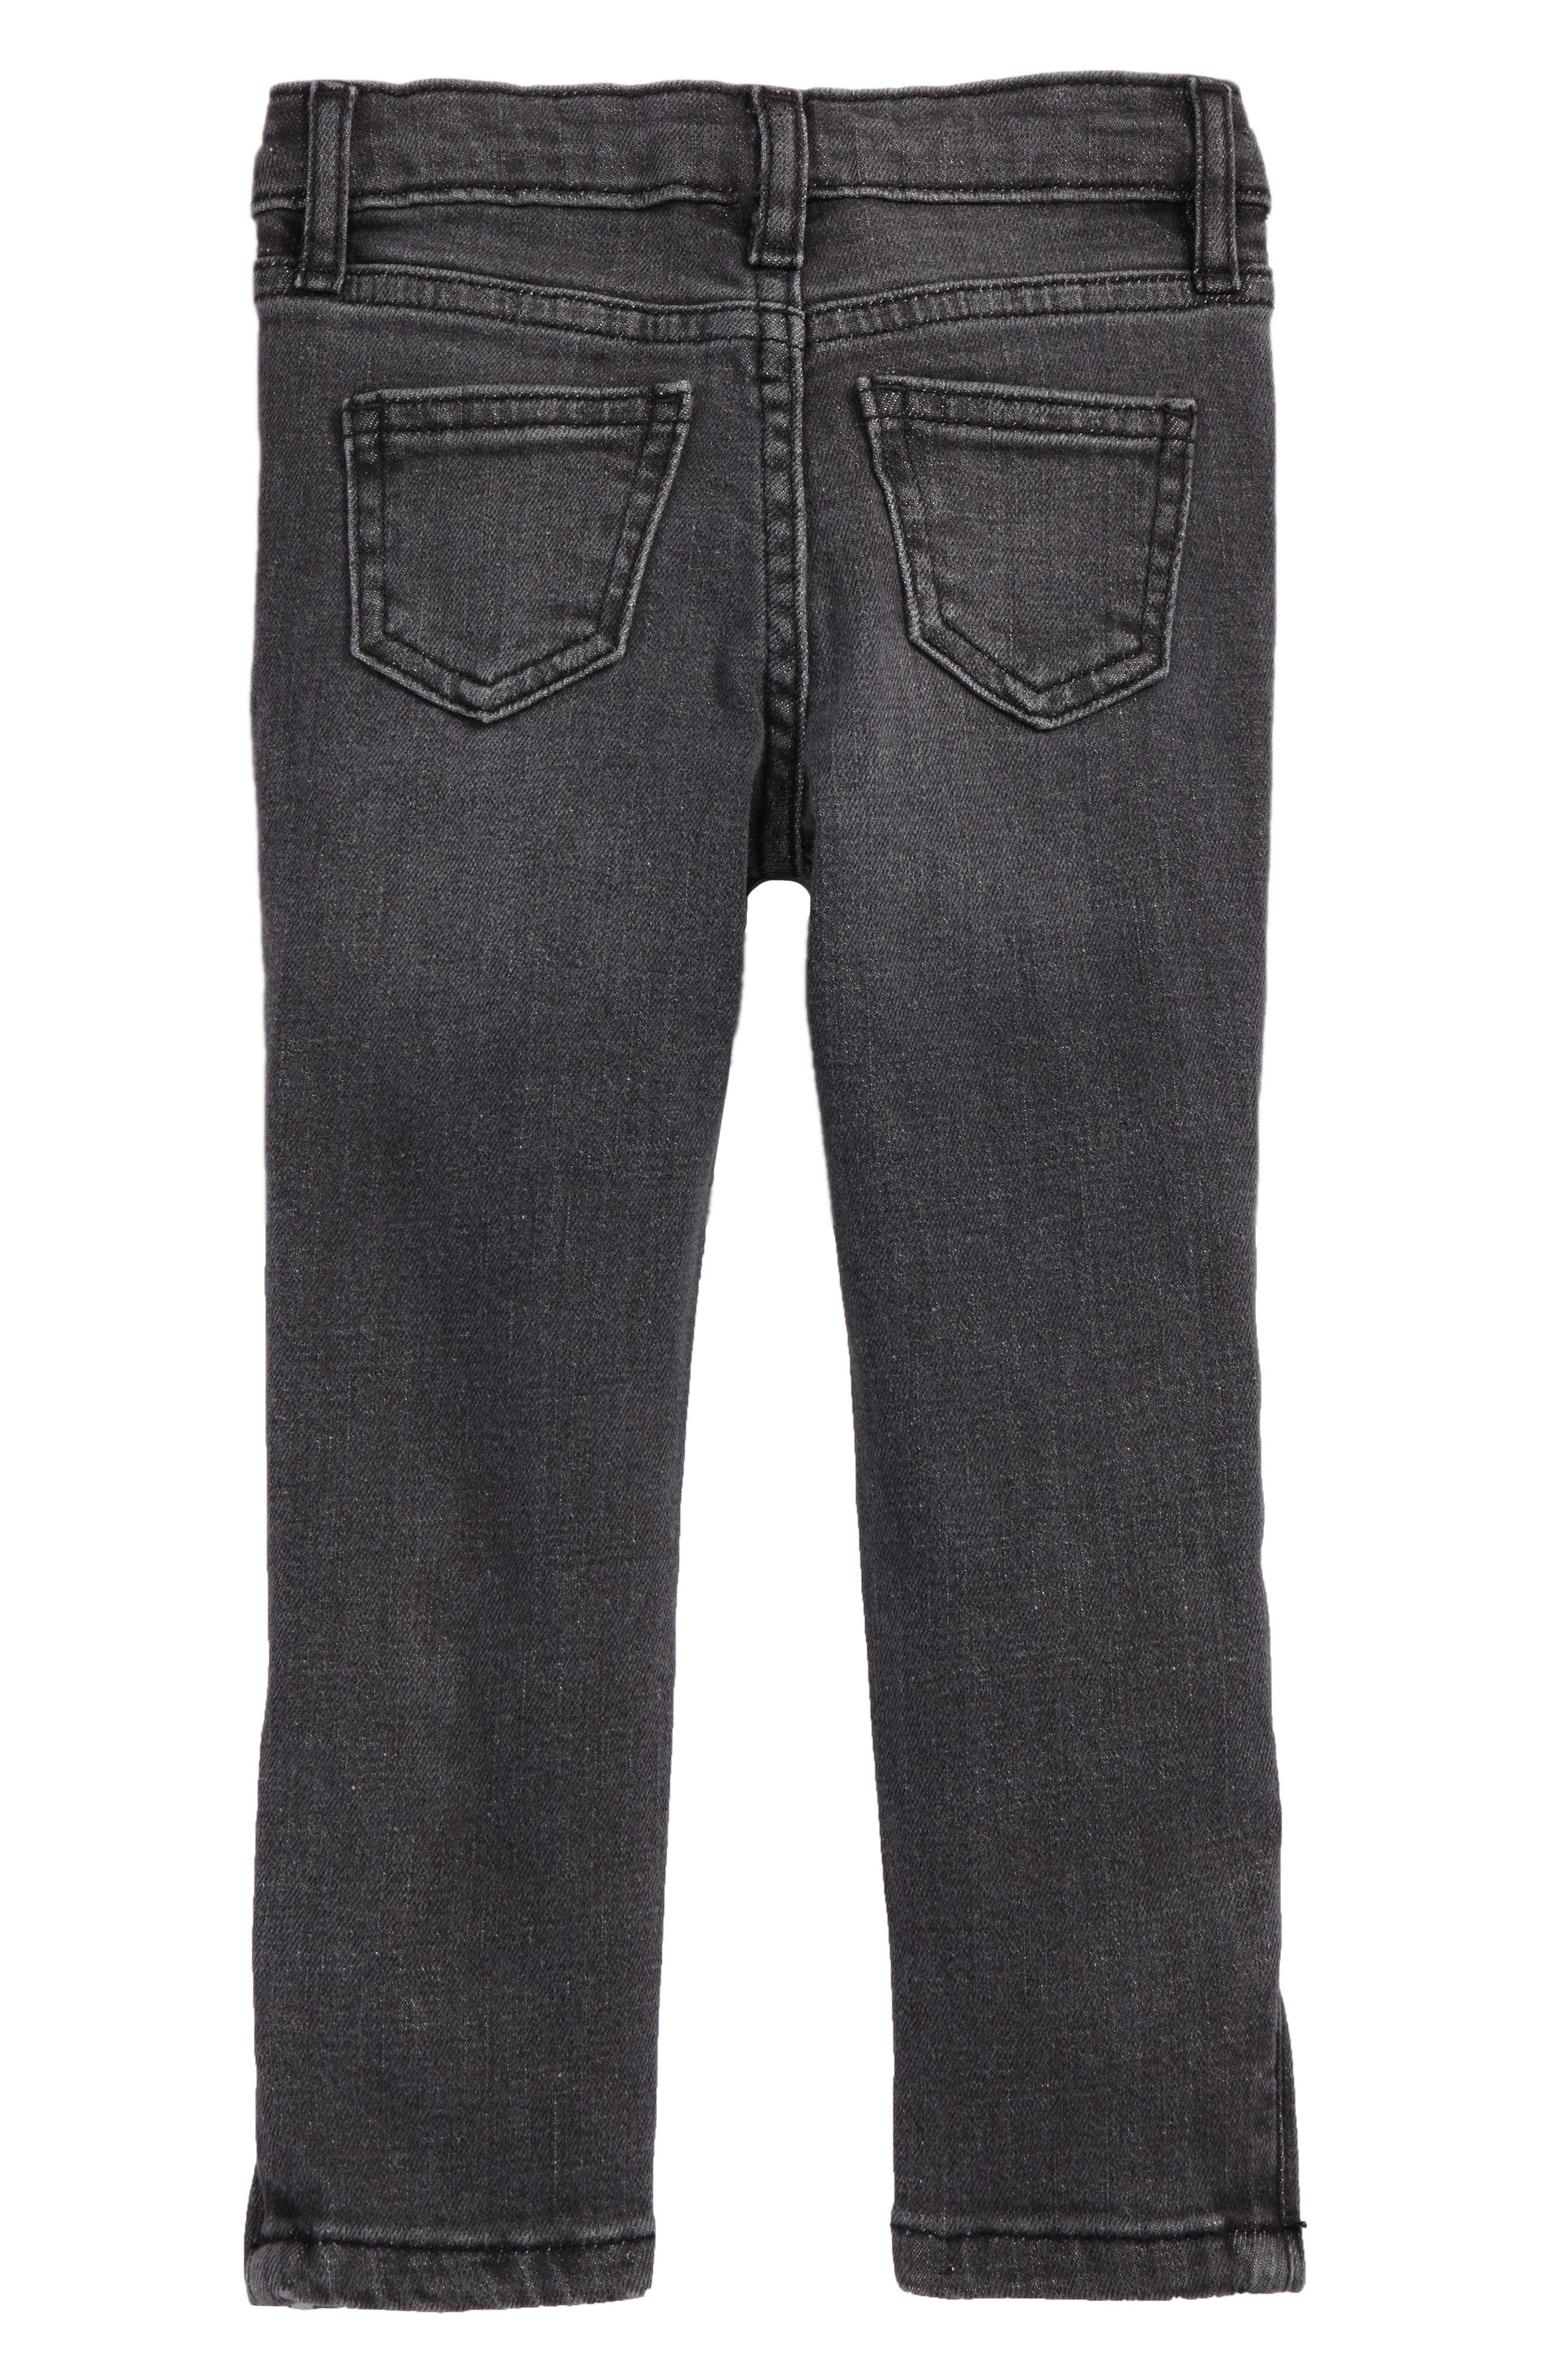 Sasha Skinny Jeans,                             Alternate thumbnail 2, color,                             020